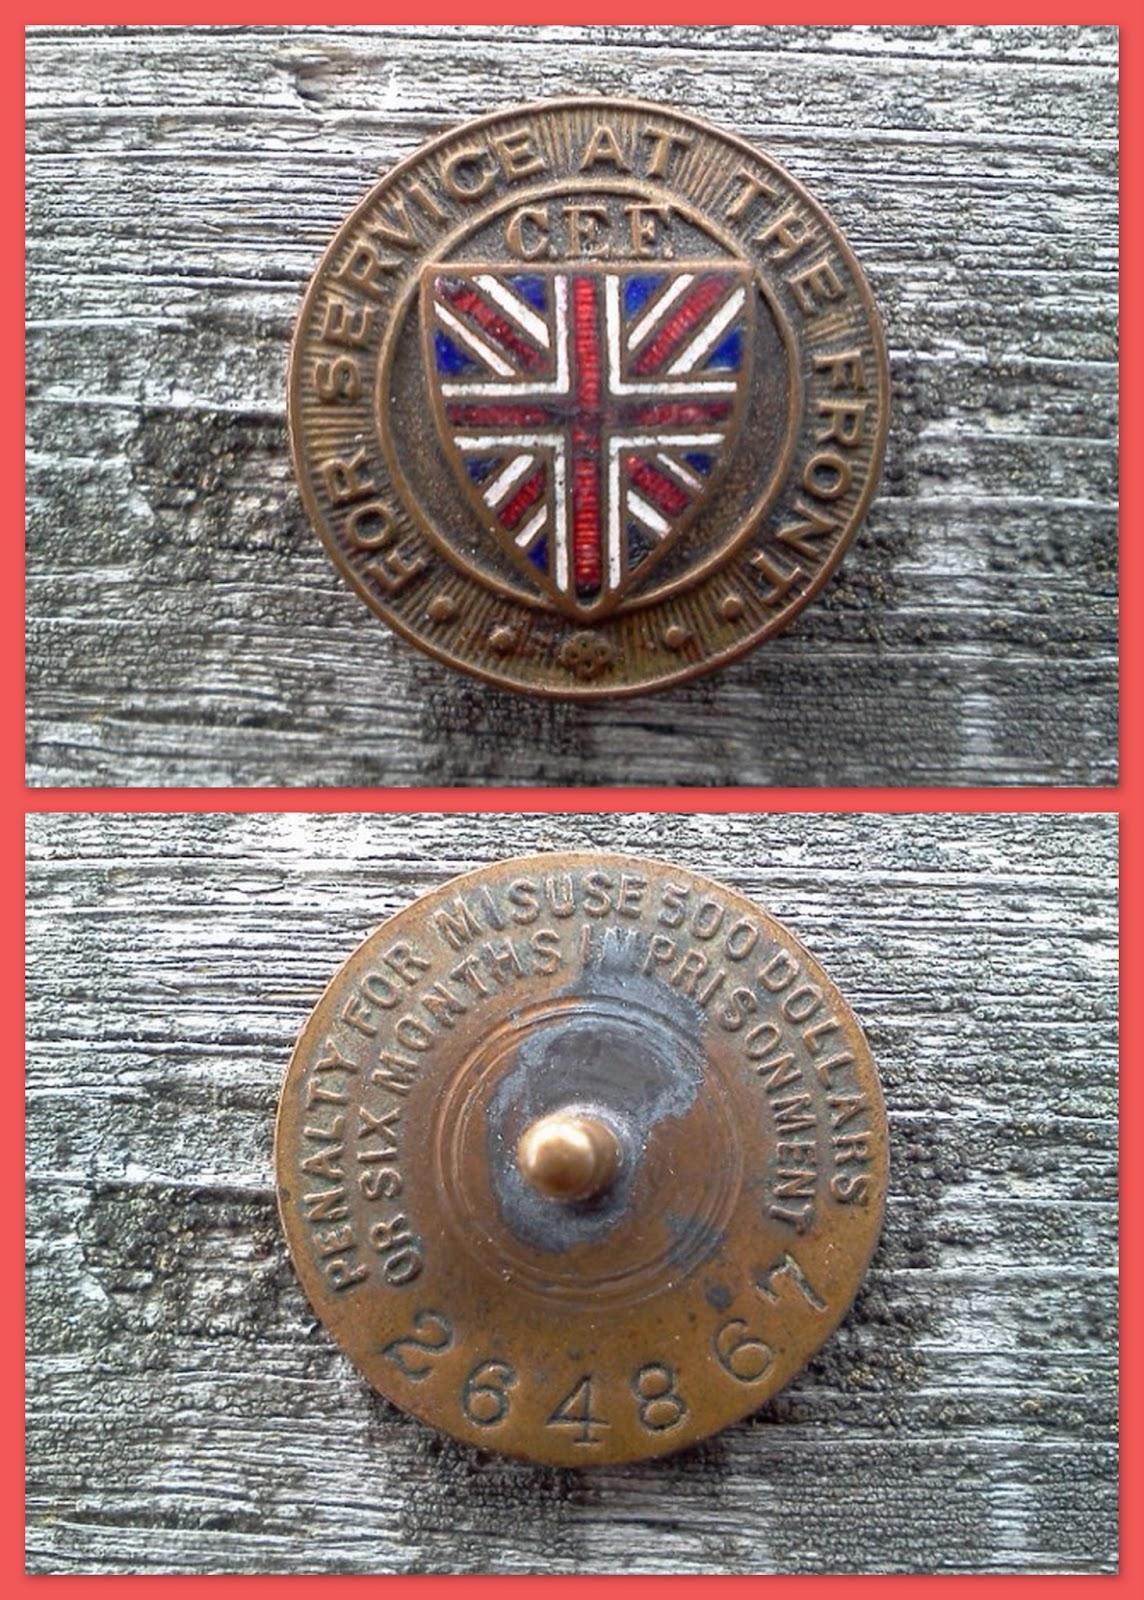 C.E.F. medal